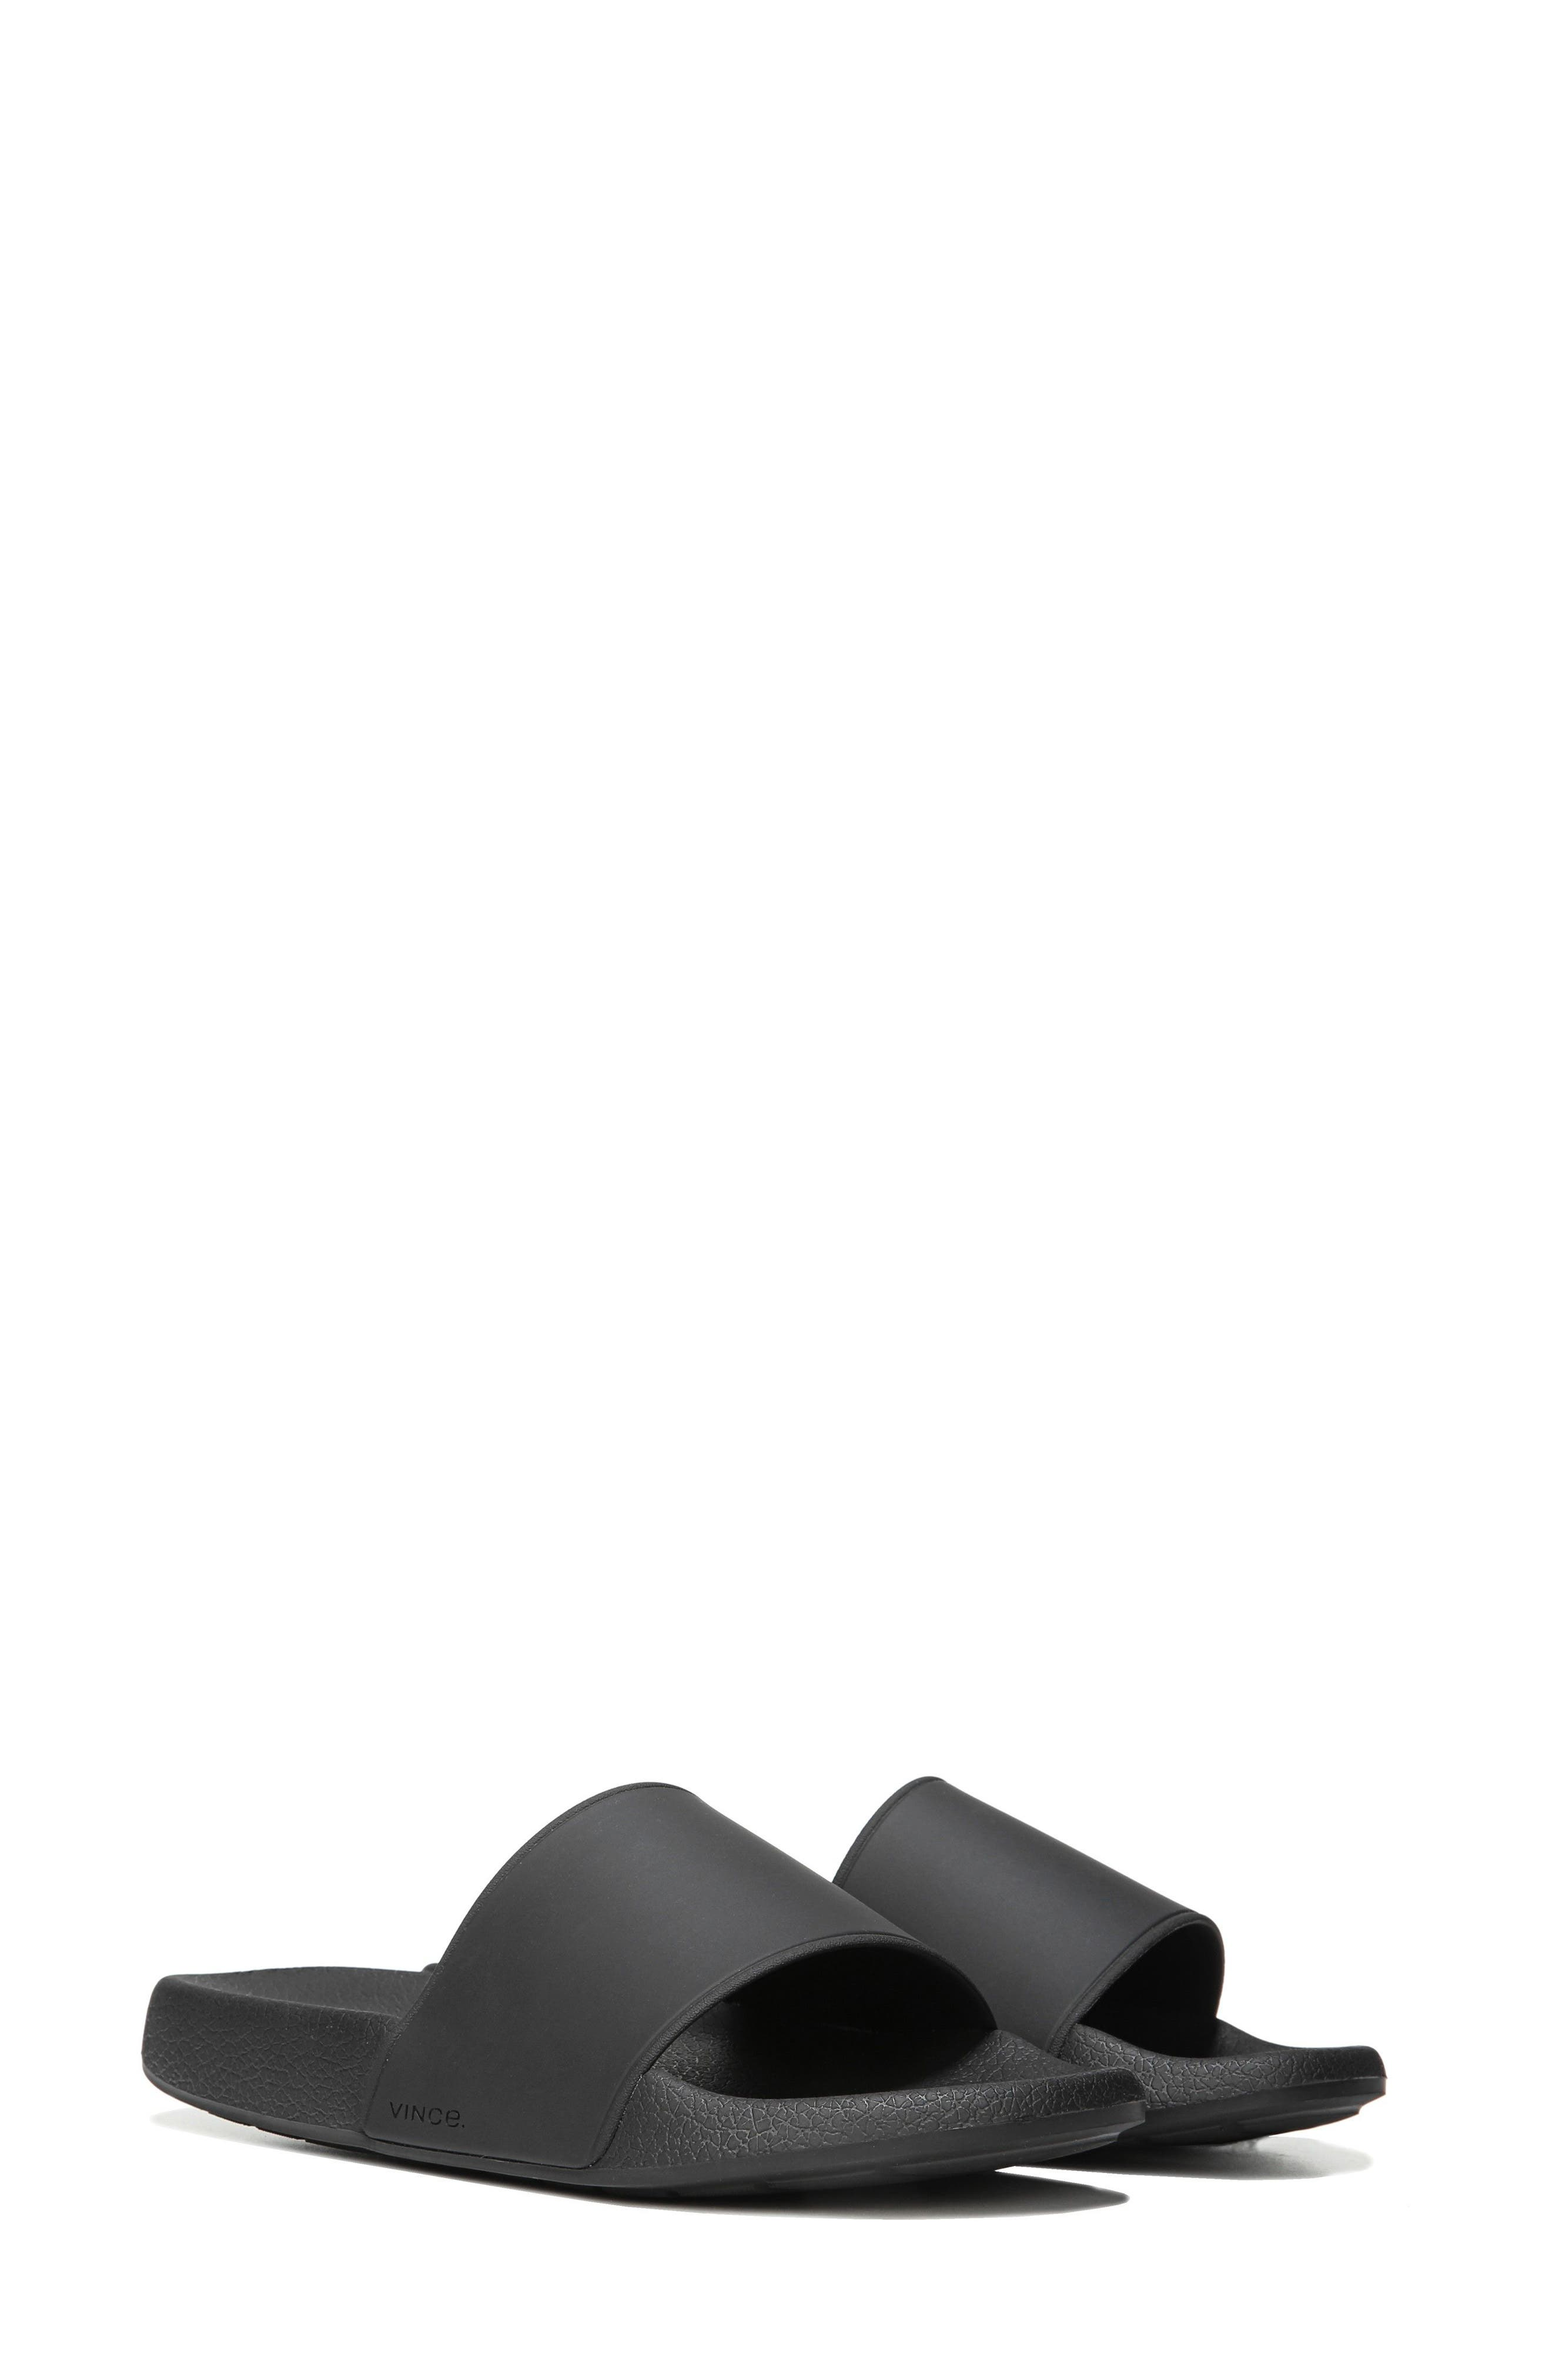 Westcoast Slide Sandal,                             Alternate thumbnail 53, color,